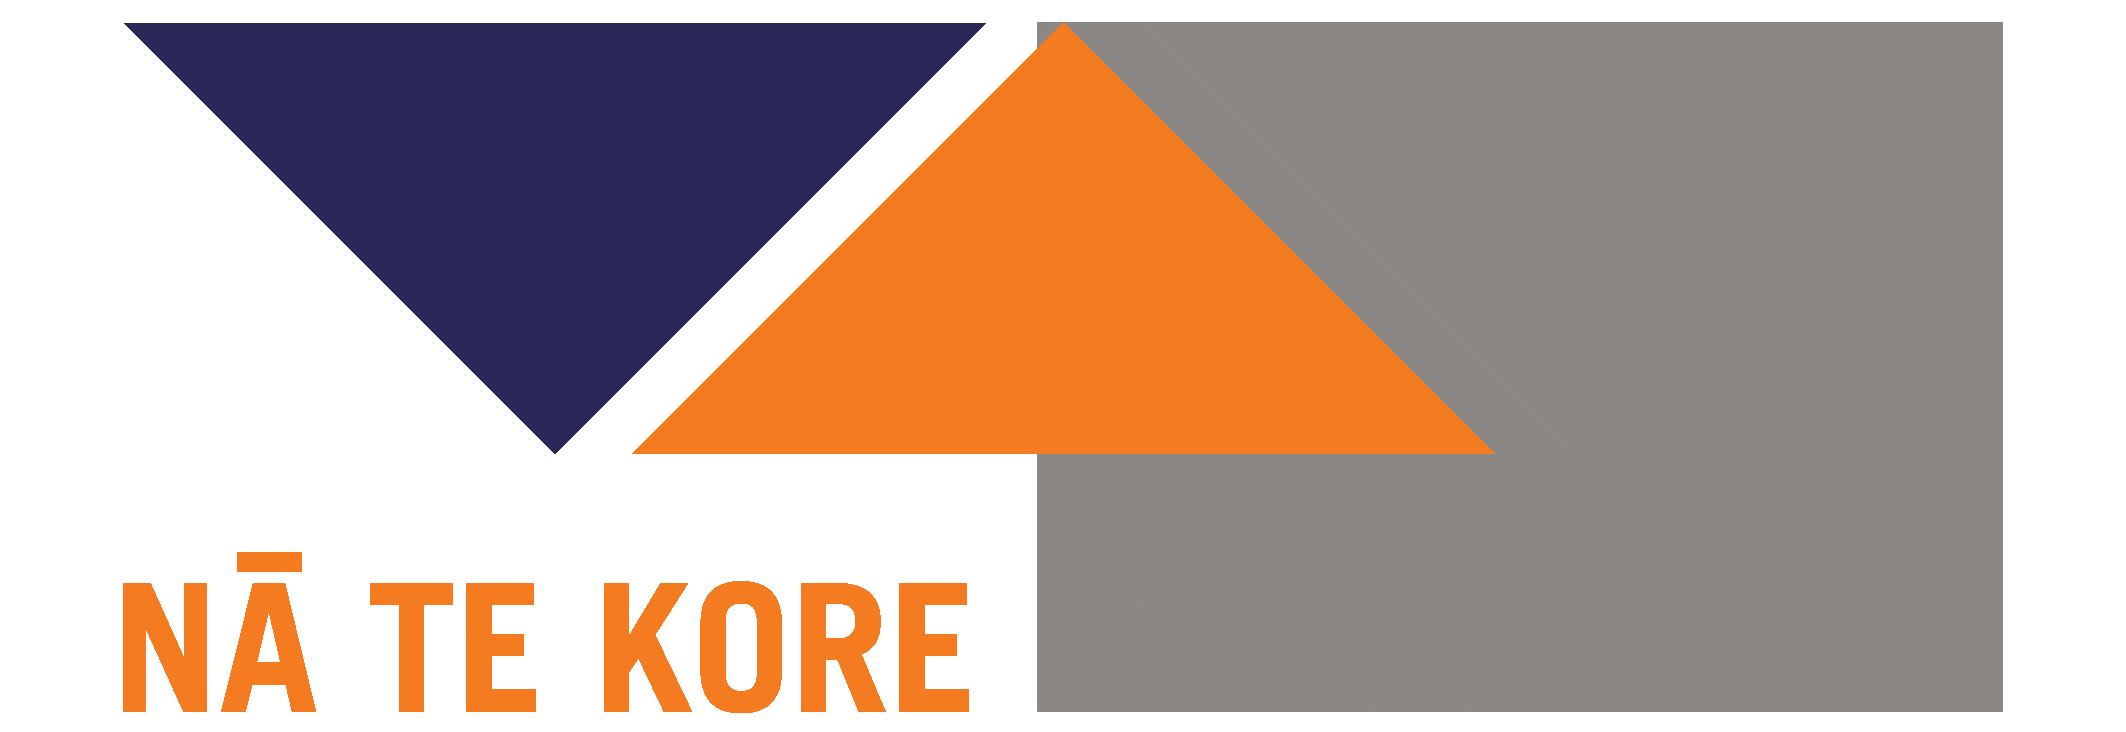 NaTeKore_Core Logo Web r4.png